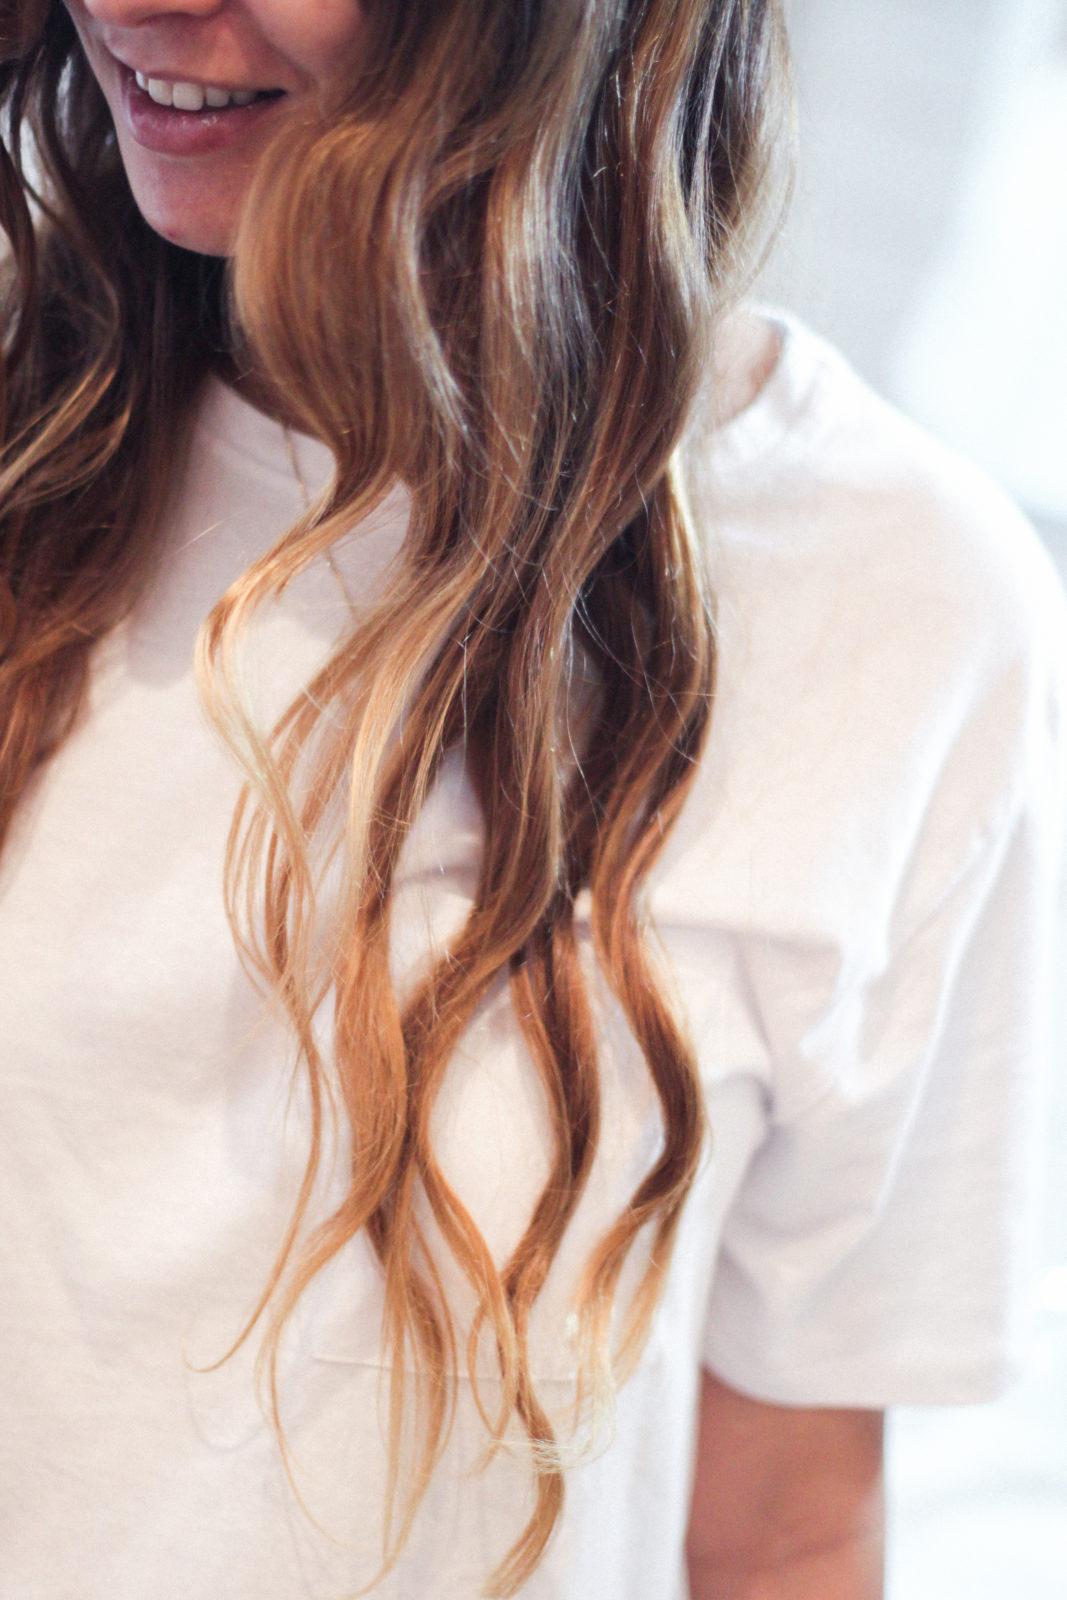 sapphire_curler_irresistibleme_hair_style-29